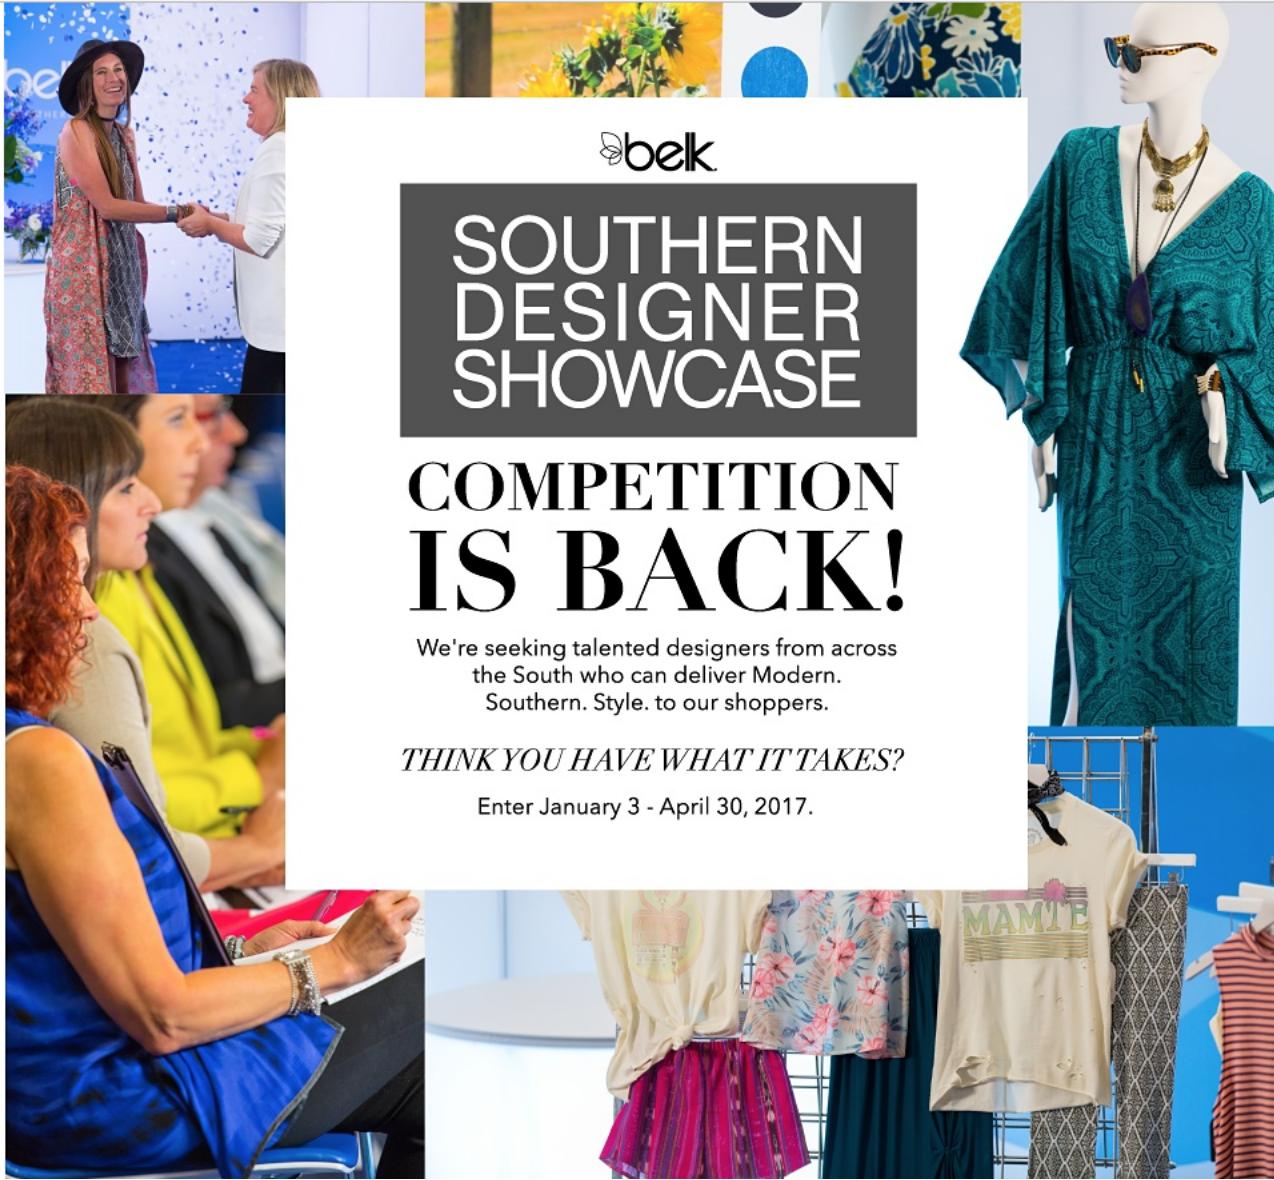 Belk Southern Designer Showcase